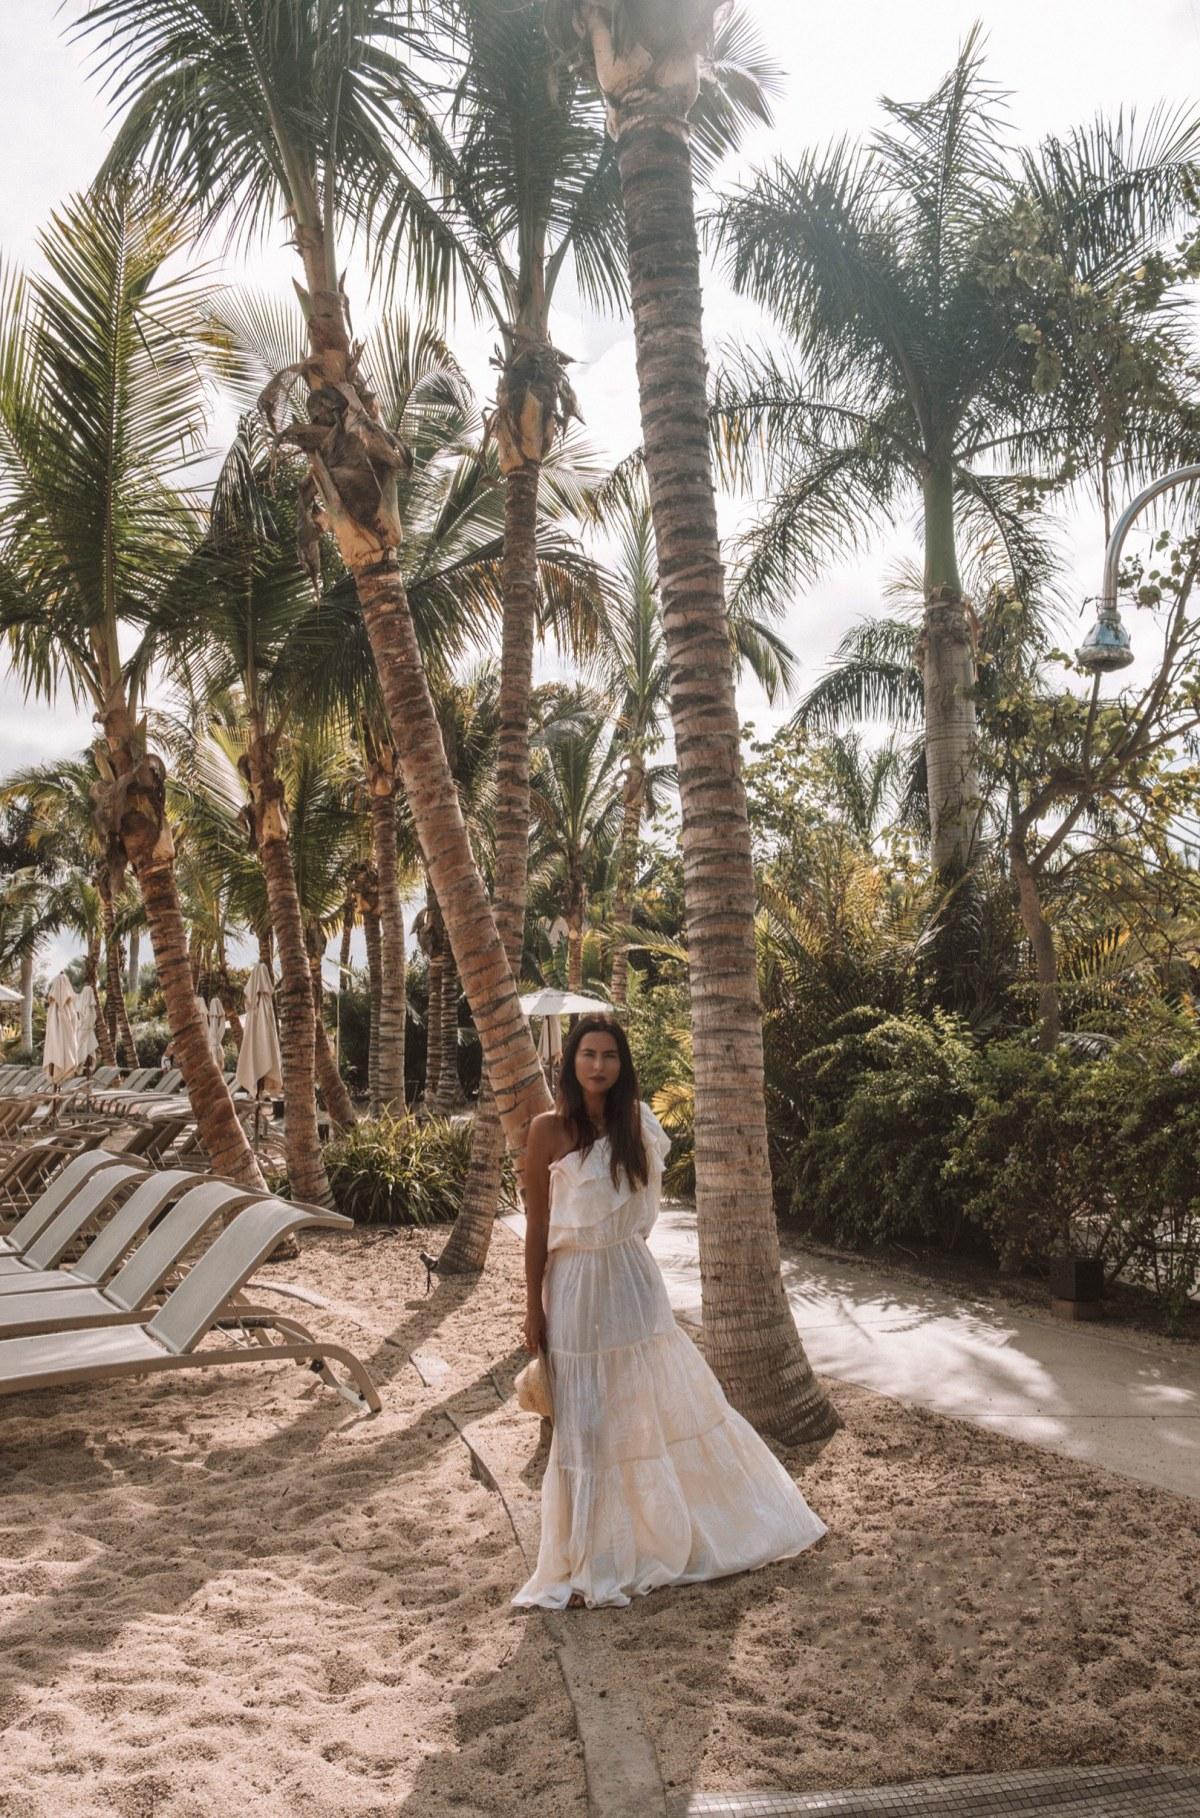 Palm trees heaven!